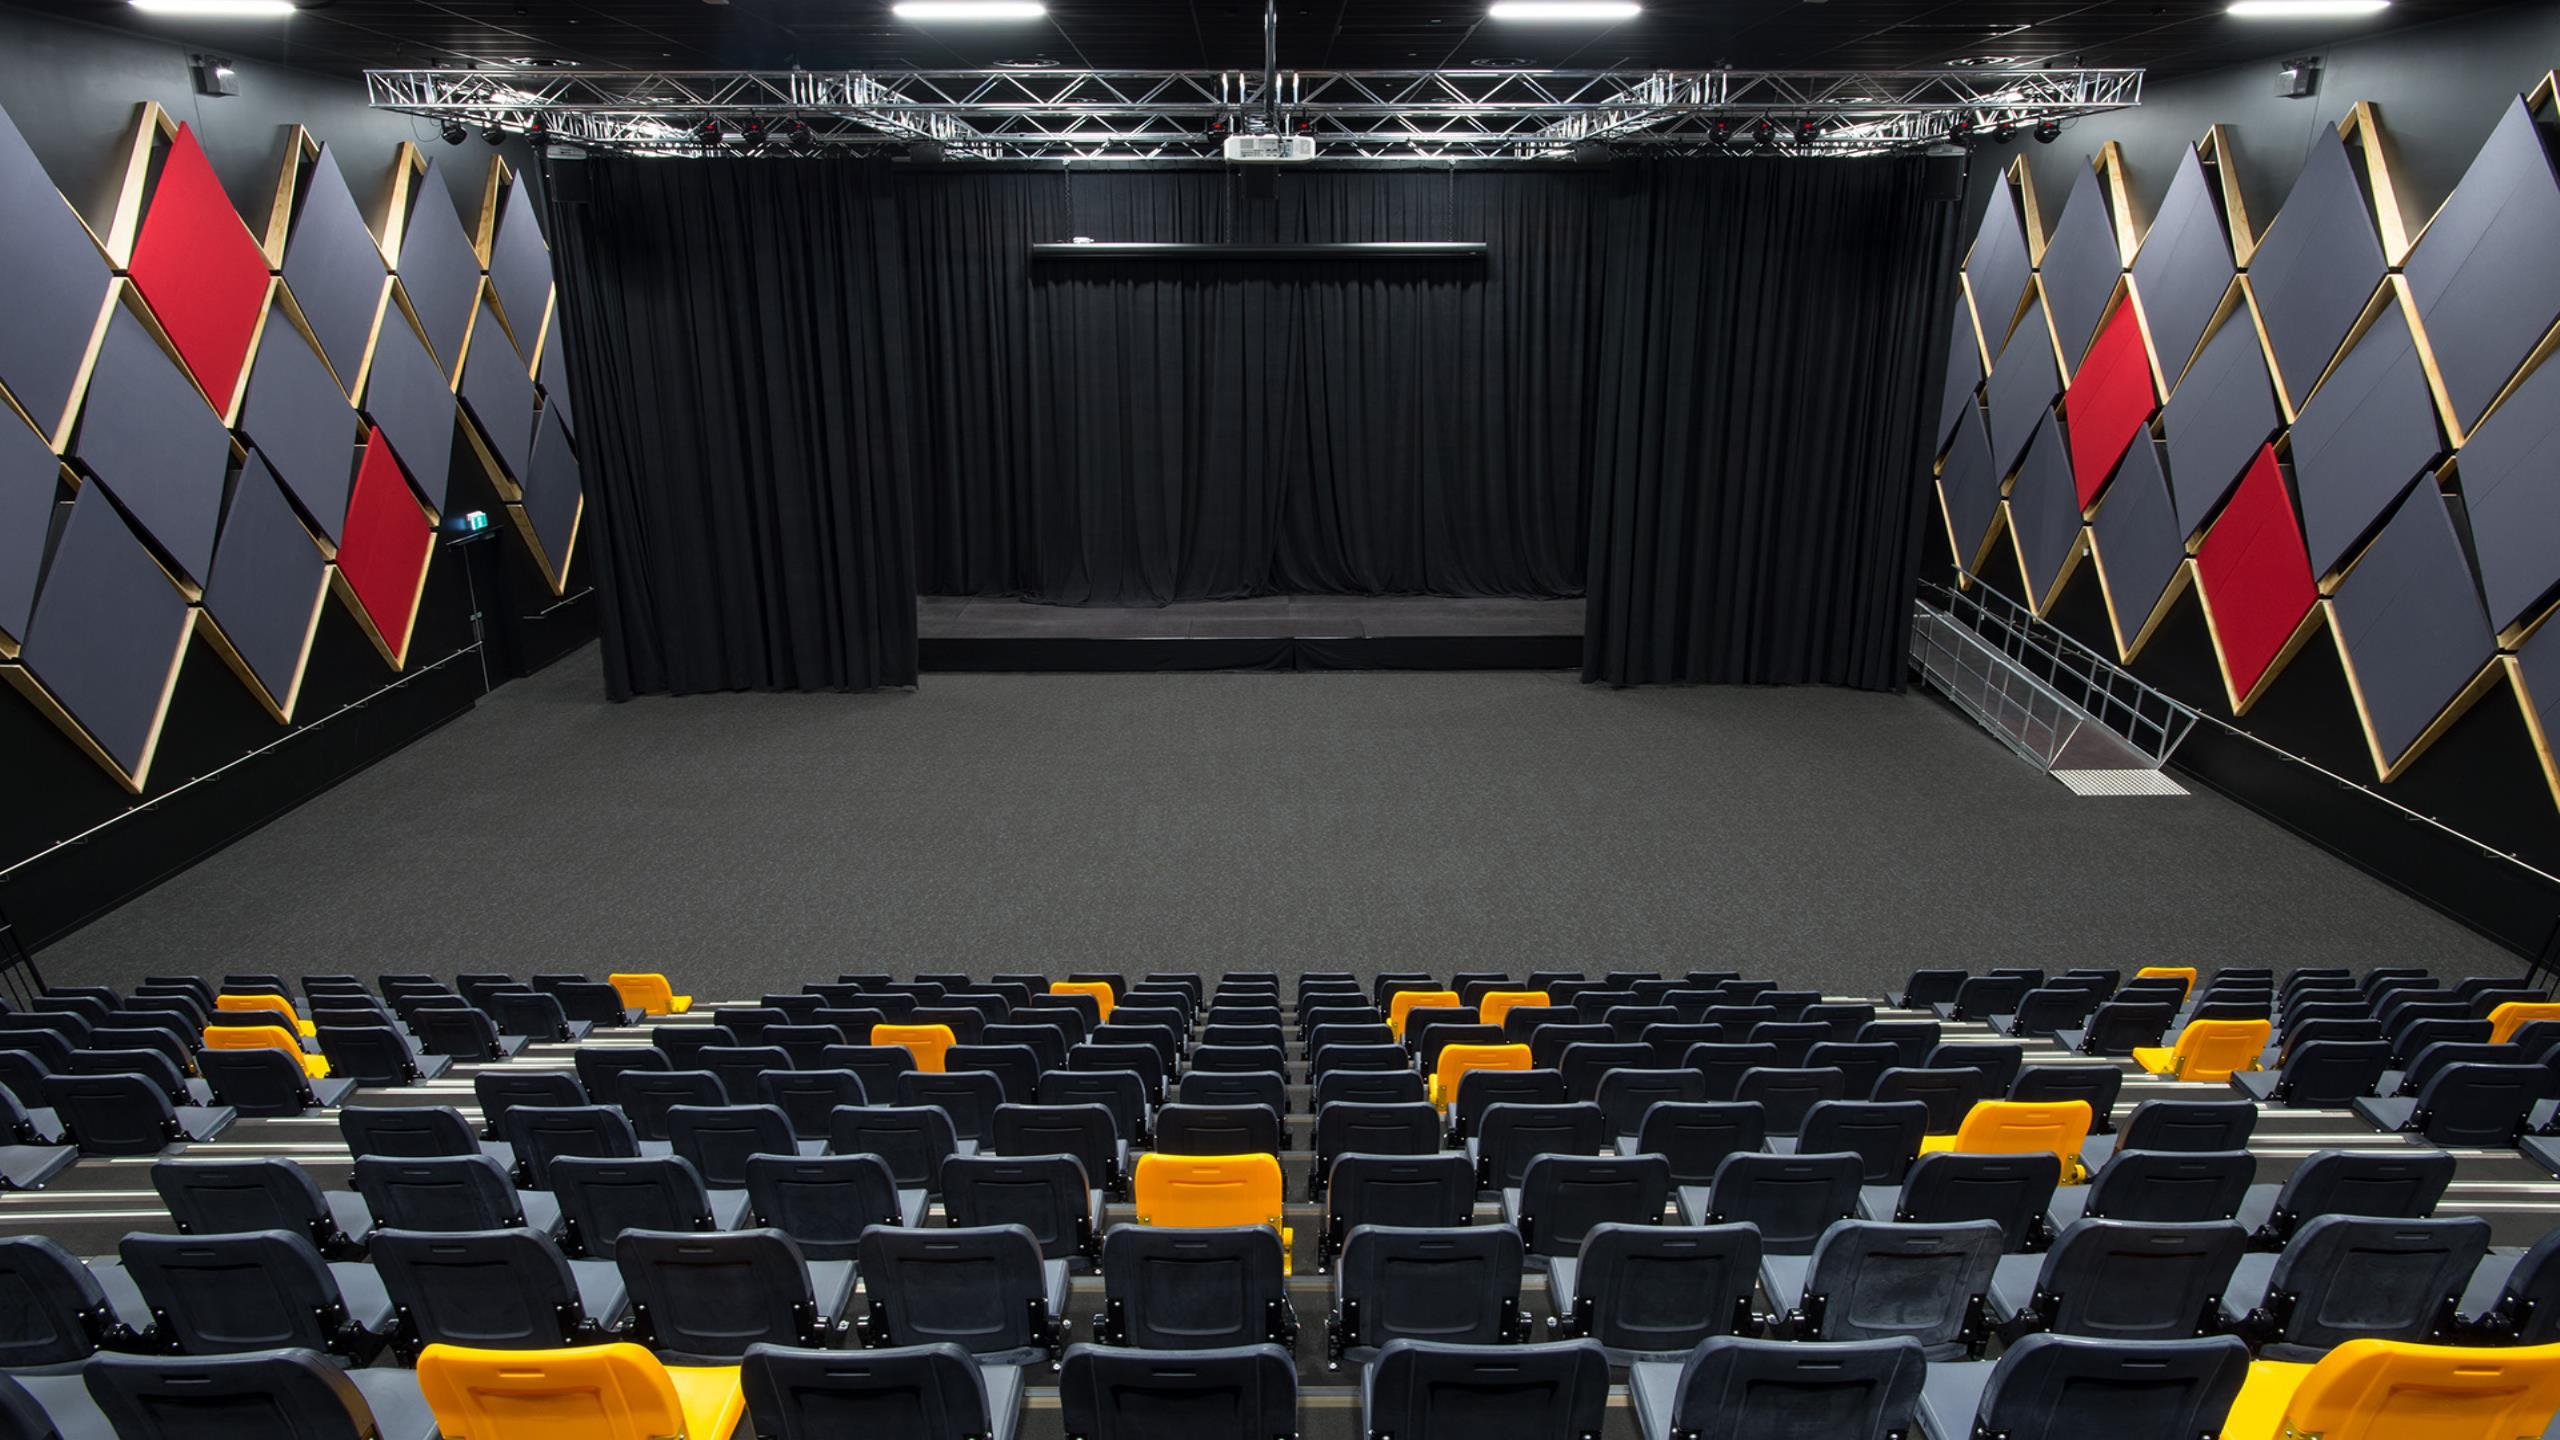 Haeata Community College Theatre - Triton Fabwall & Ridgeline